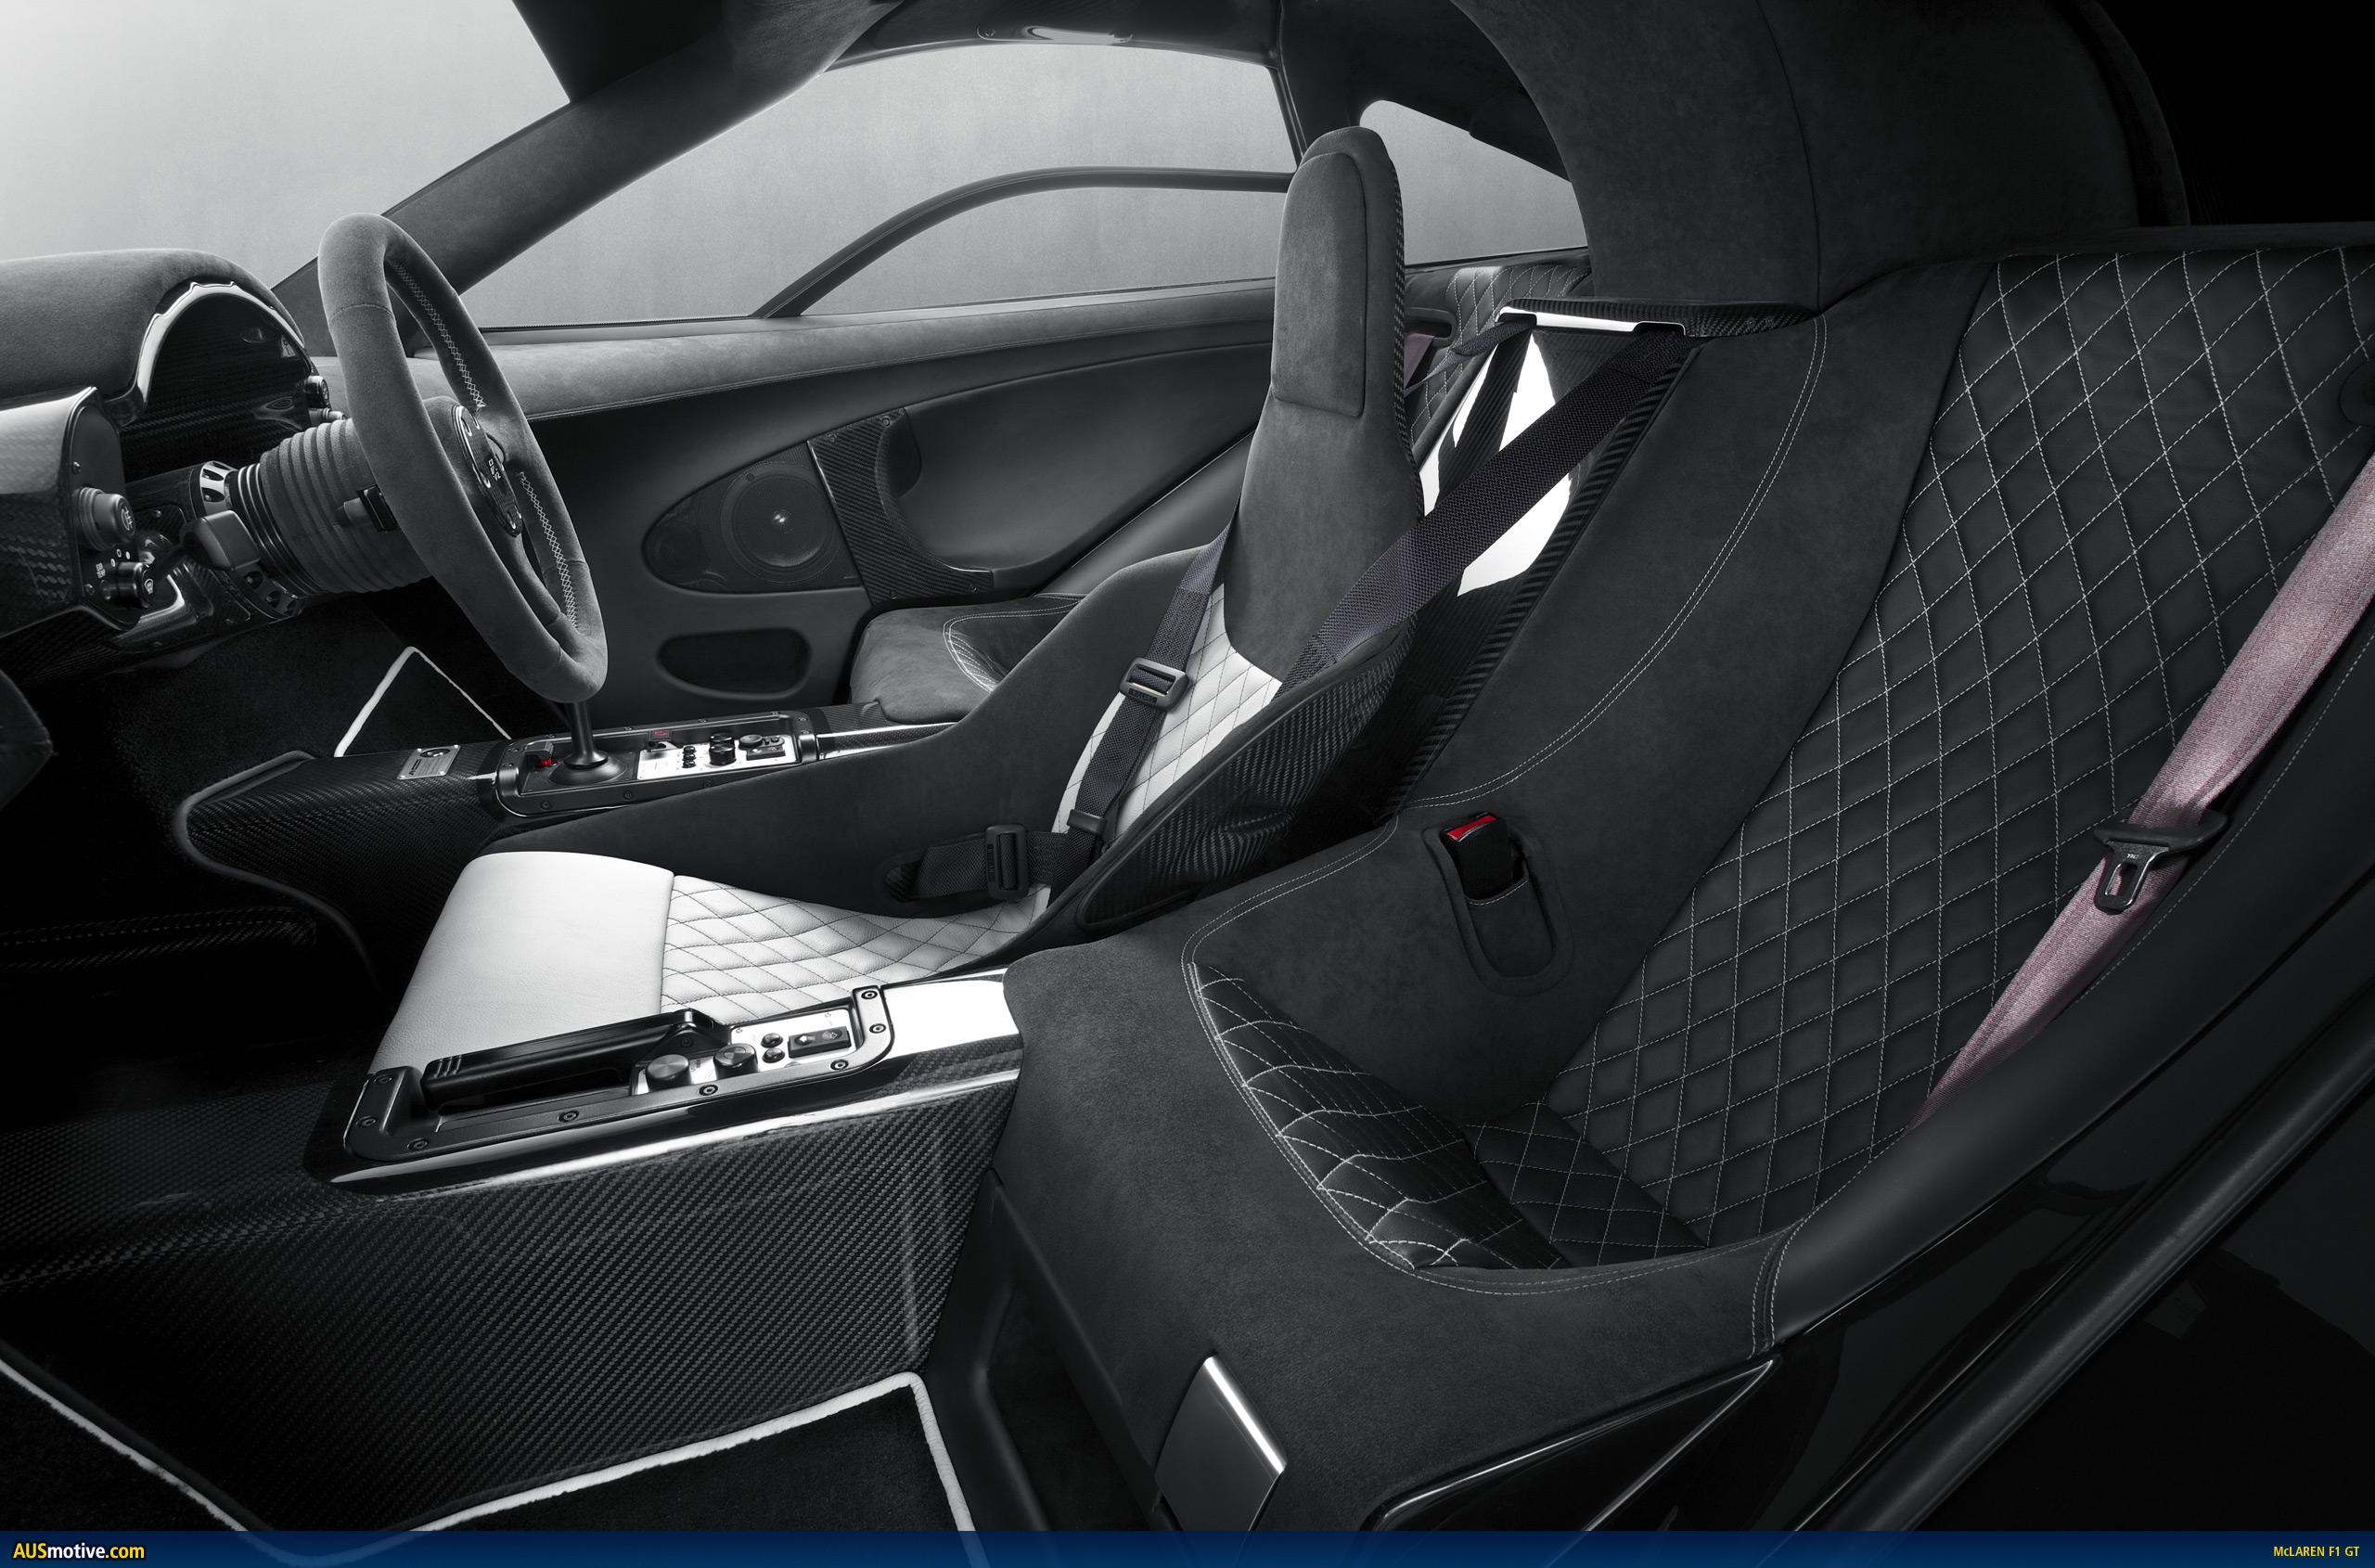 F1: AUSmotive.com » McLaren F1 GT Wallpapers